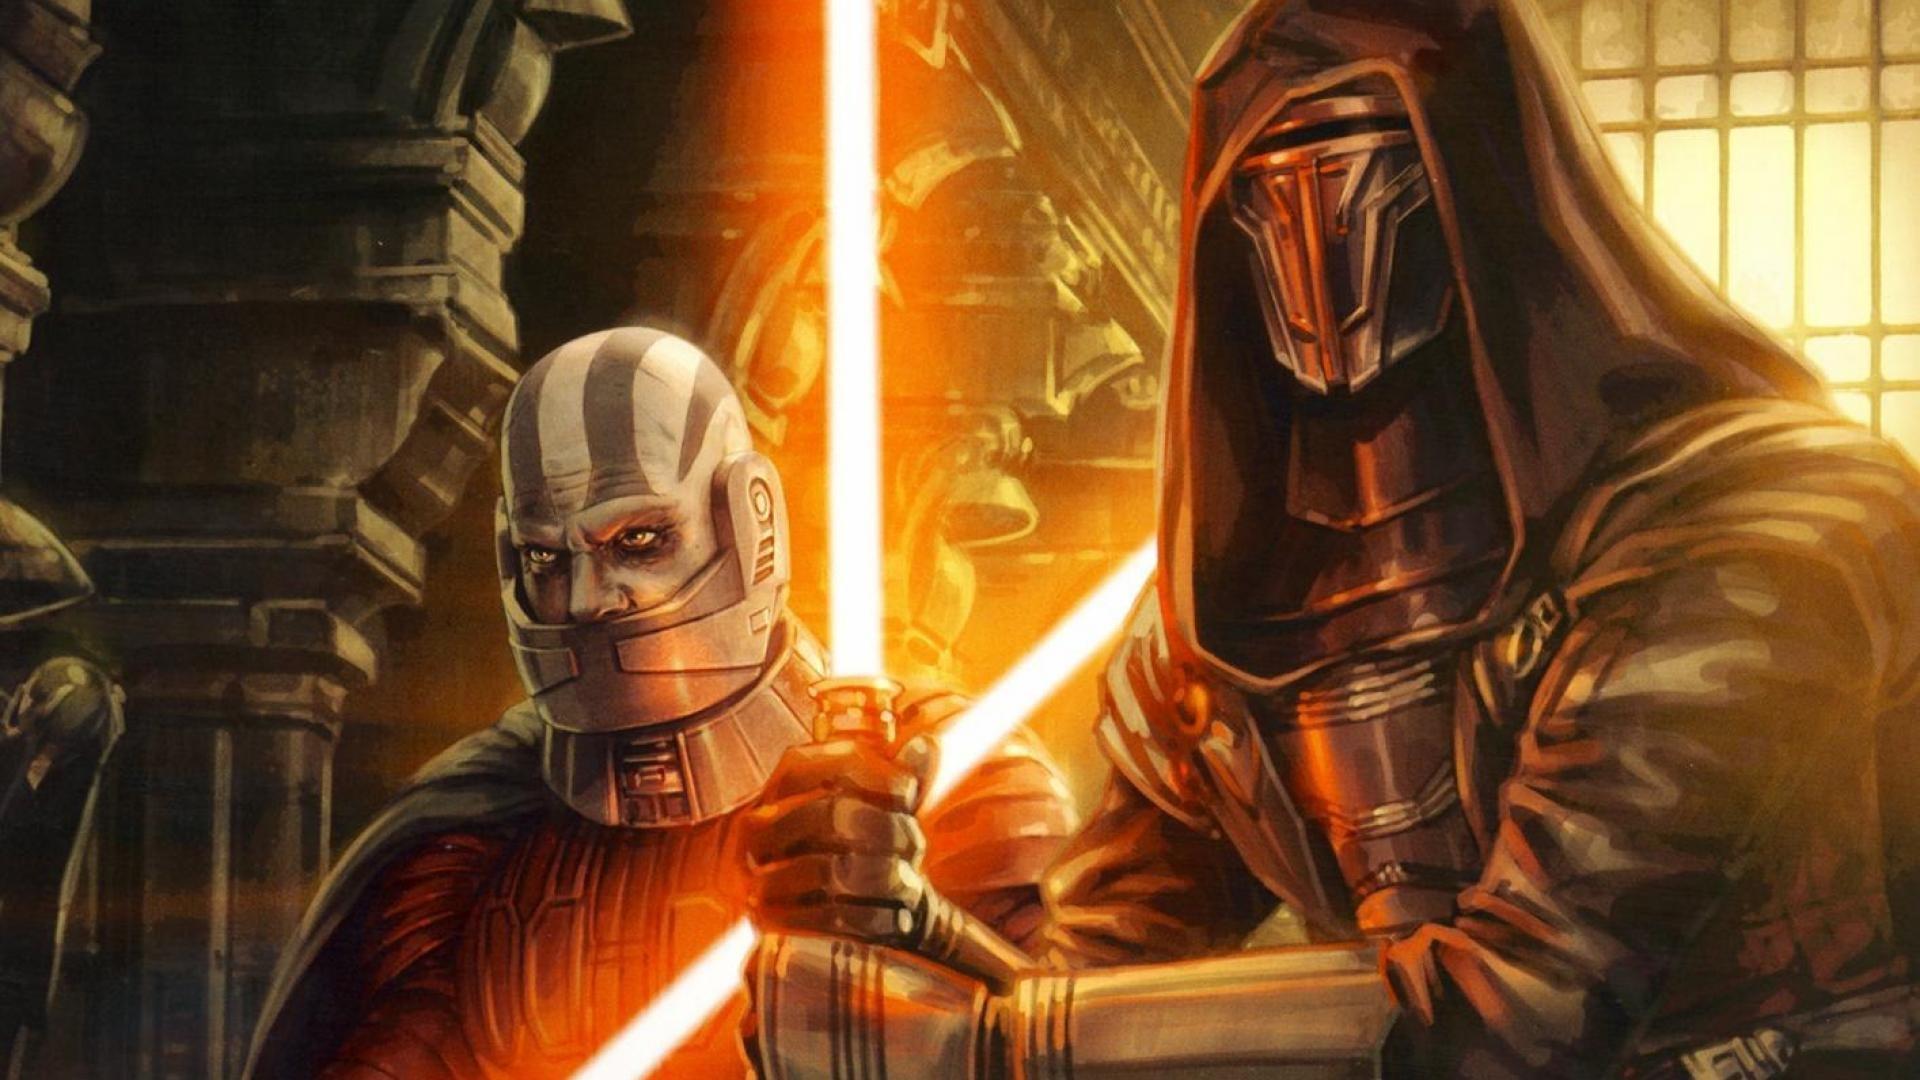 General 1920x1080 Star Wars Darth Revan Darth Malak Sith Star Wars: The Old Republic